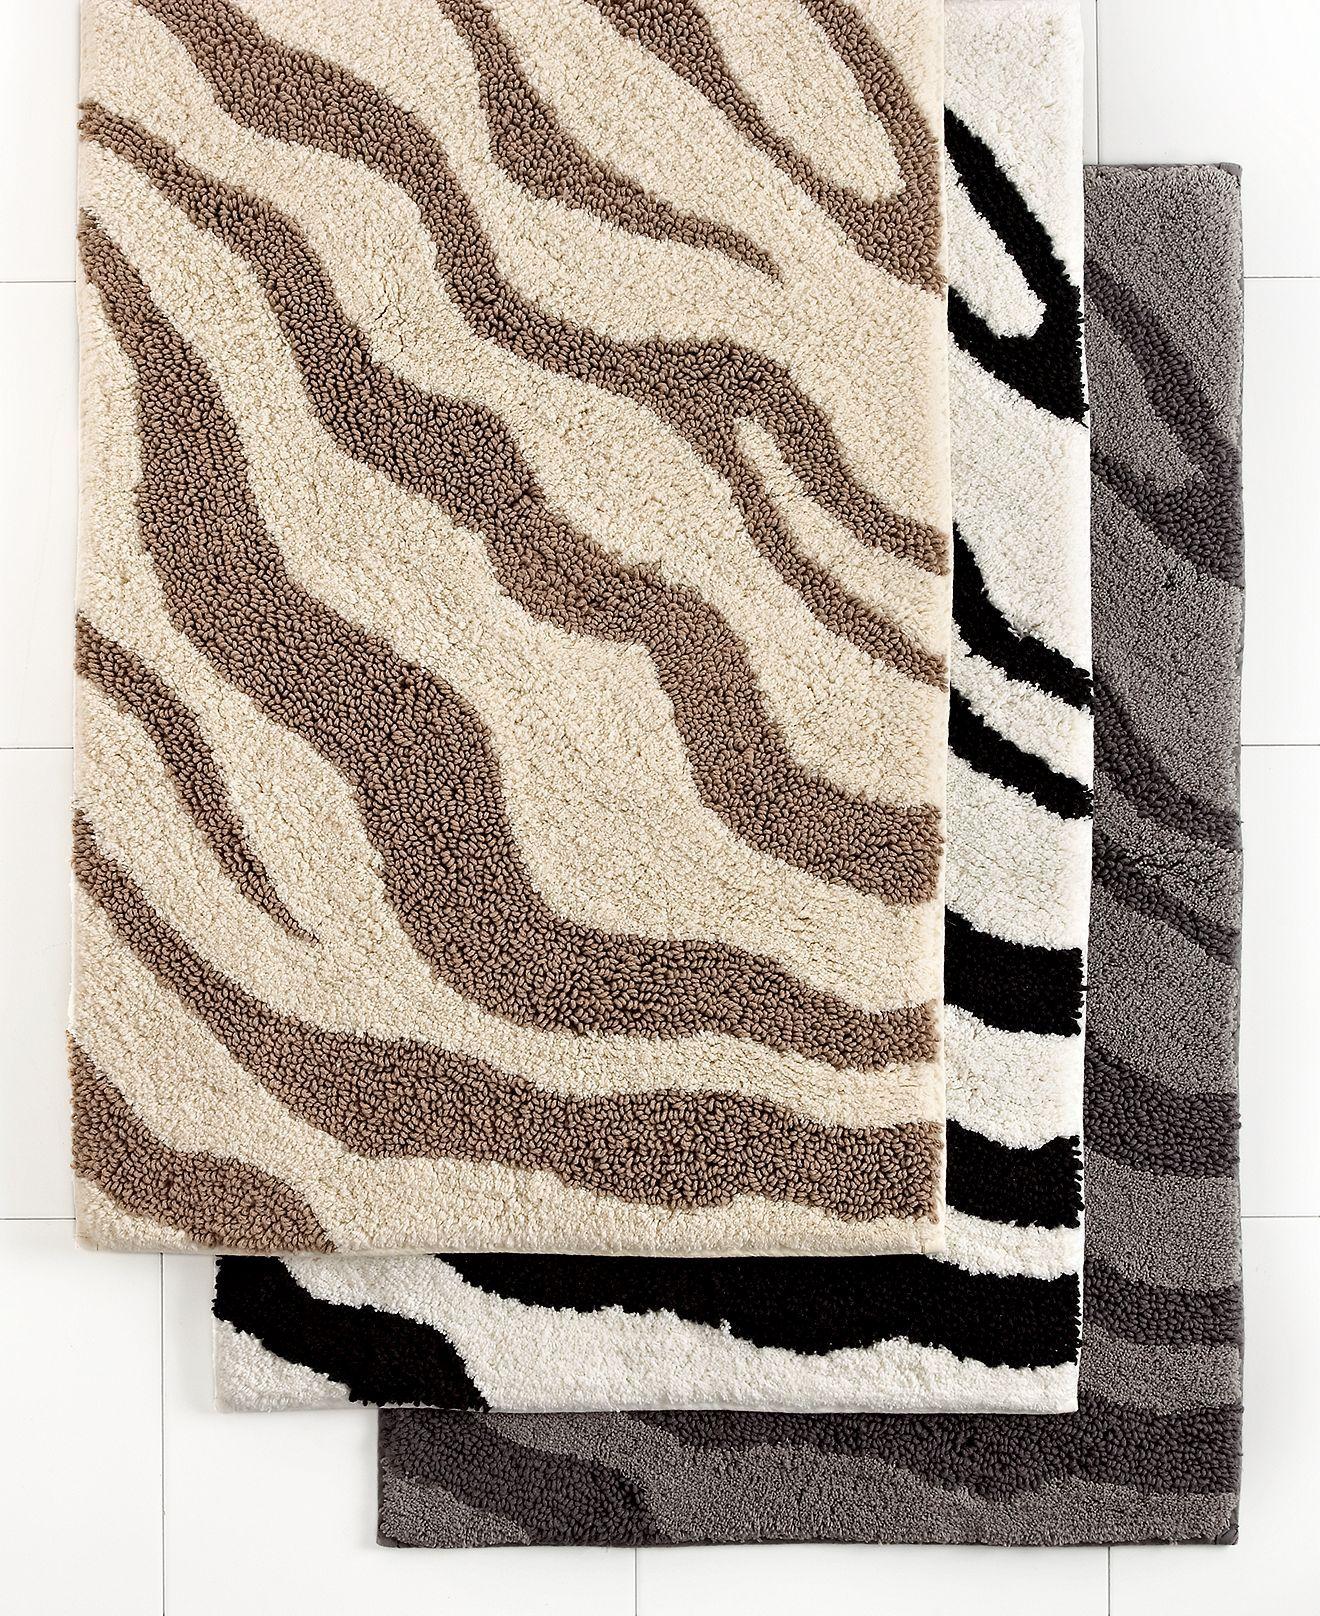 Closeout Charter Club Zebra Bath Rug Collection Reviews Bath Rugs Bath Mats Bed Bath Macy S Zebra Bath Rug Bath Rug Bath Rugs